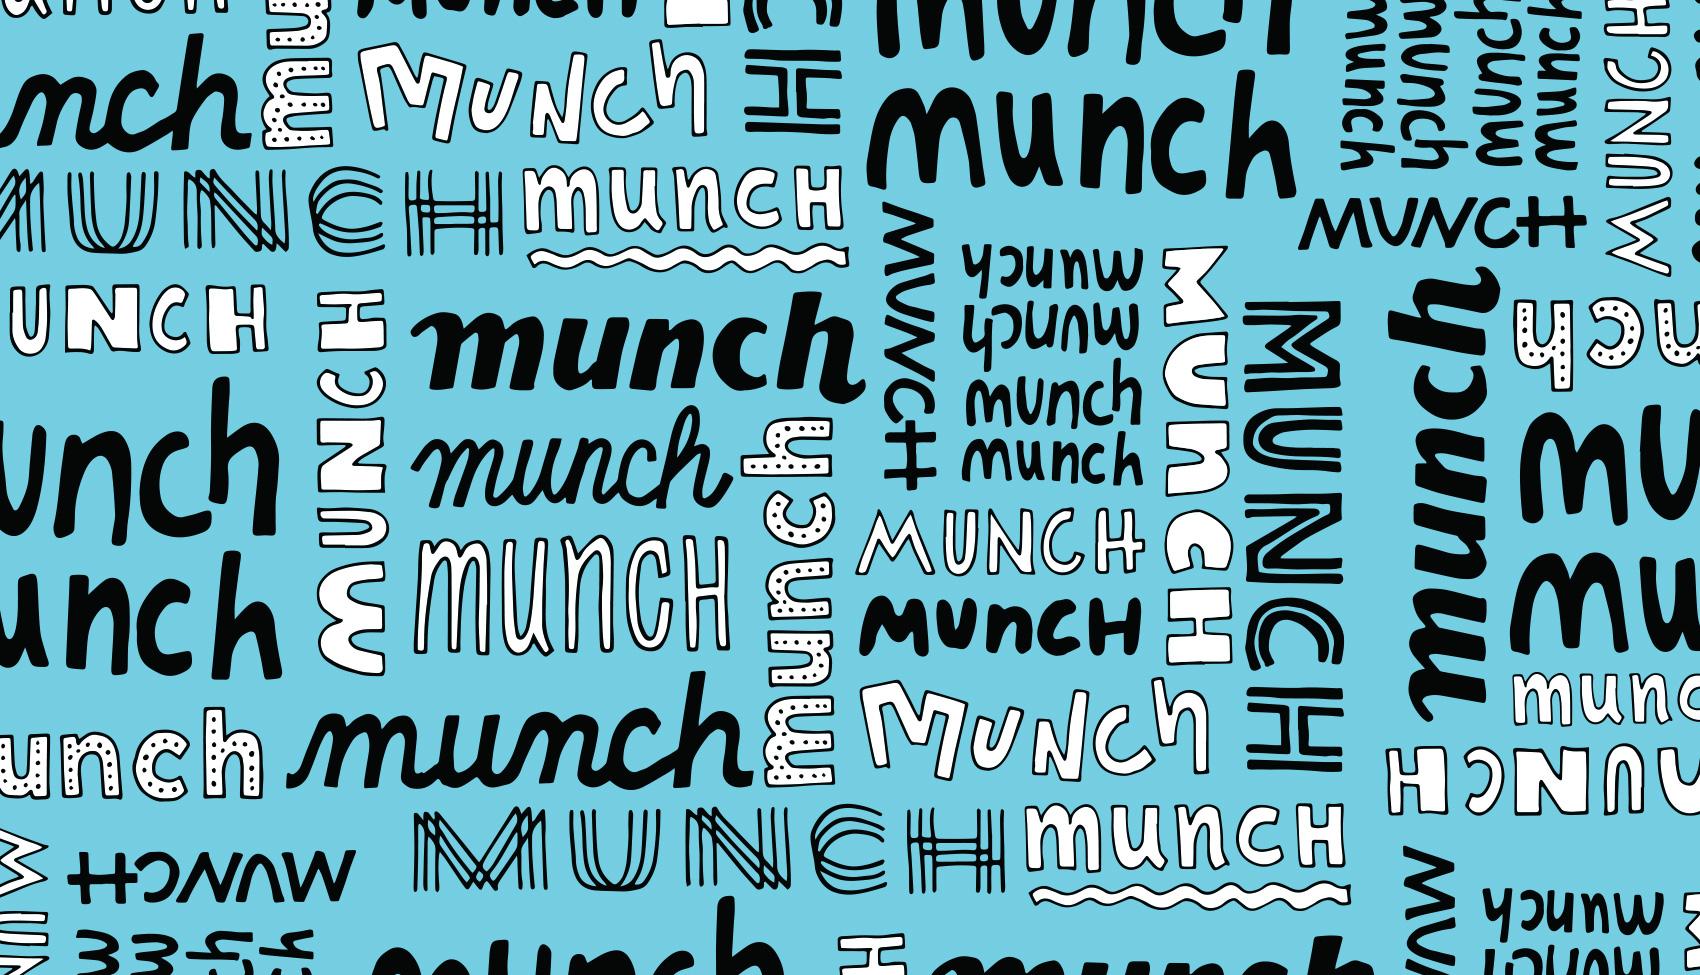 Lettering pattern hand drawn in ink - munch munch munch munch.